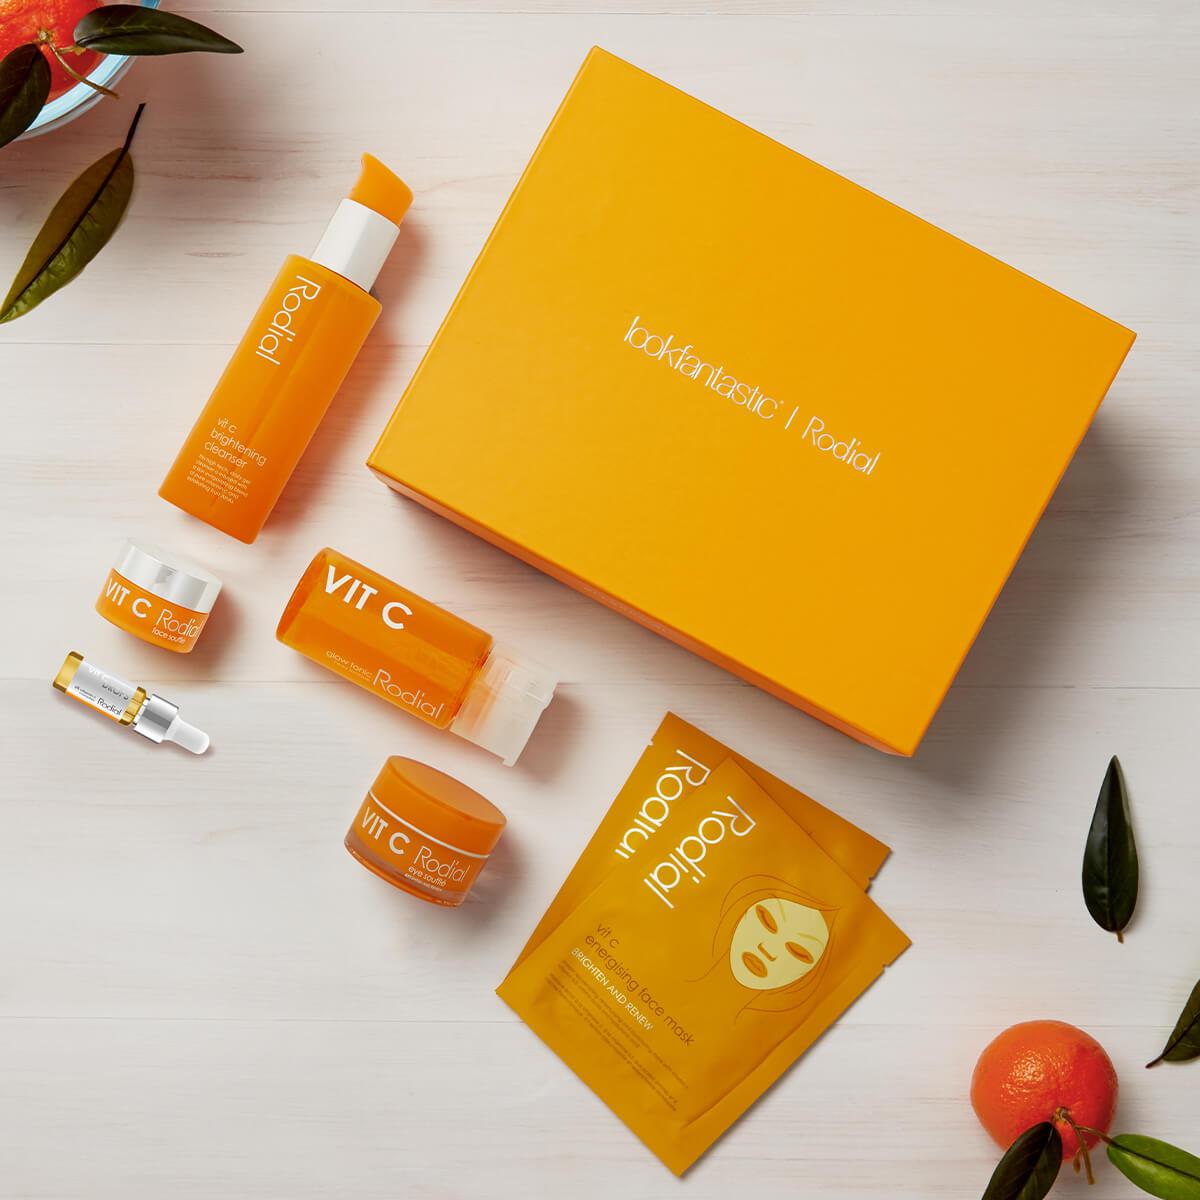 lookfantastic Rodial Vit C Beauty Box